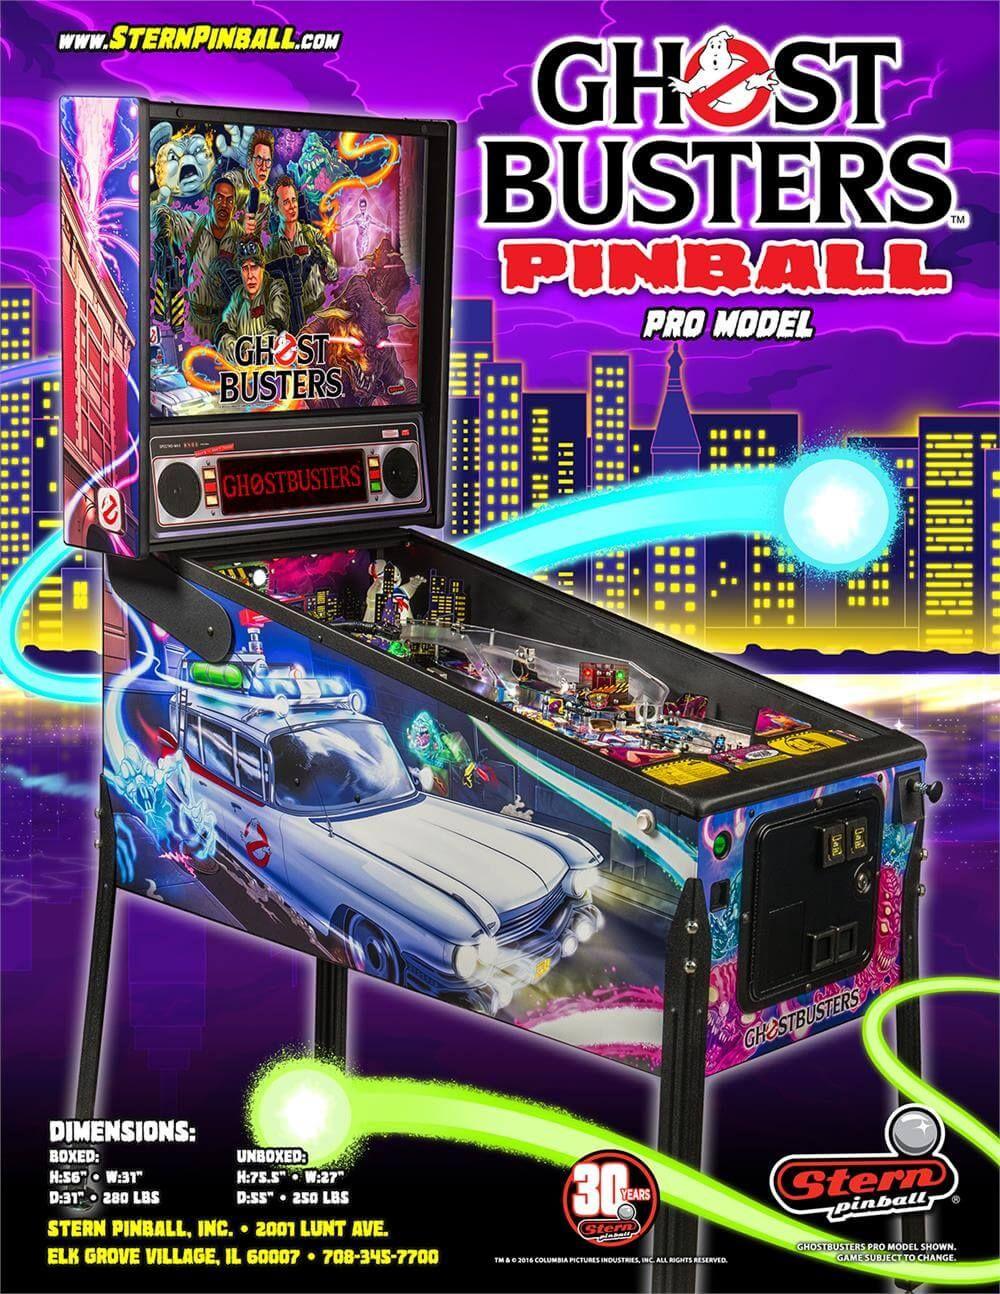 Ghostbusters Pinball.jpg